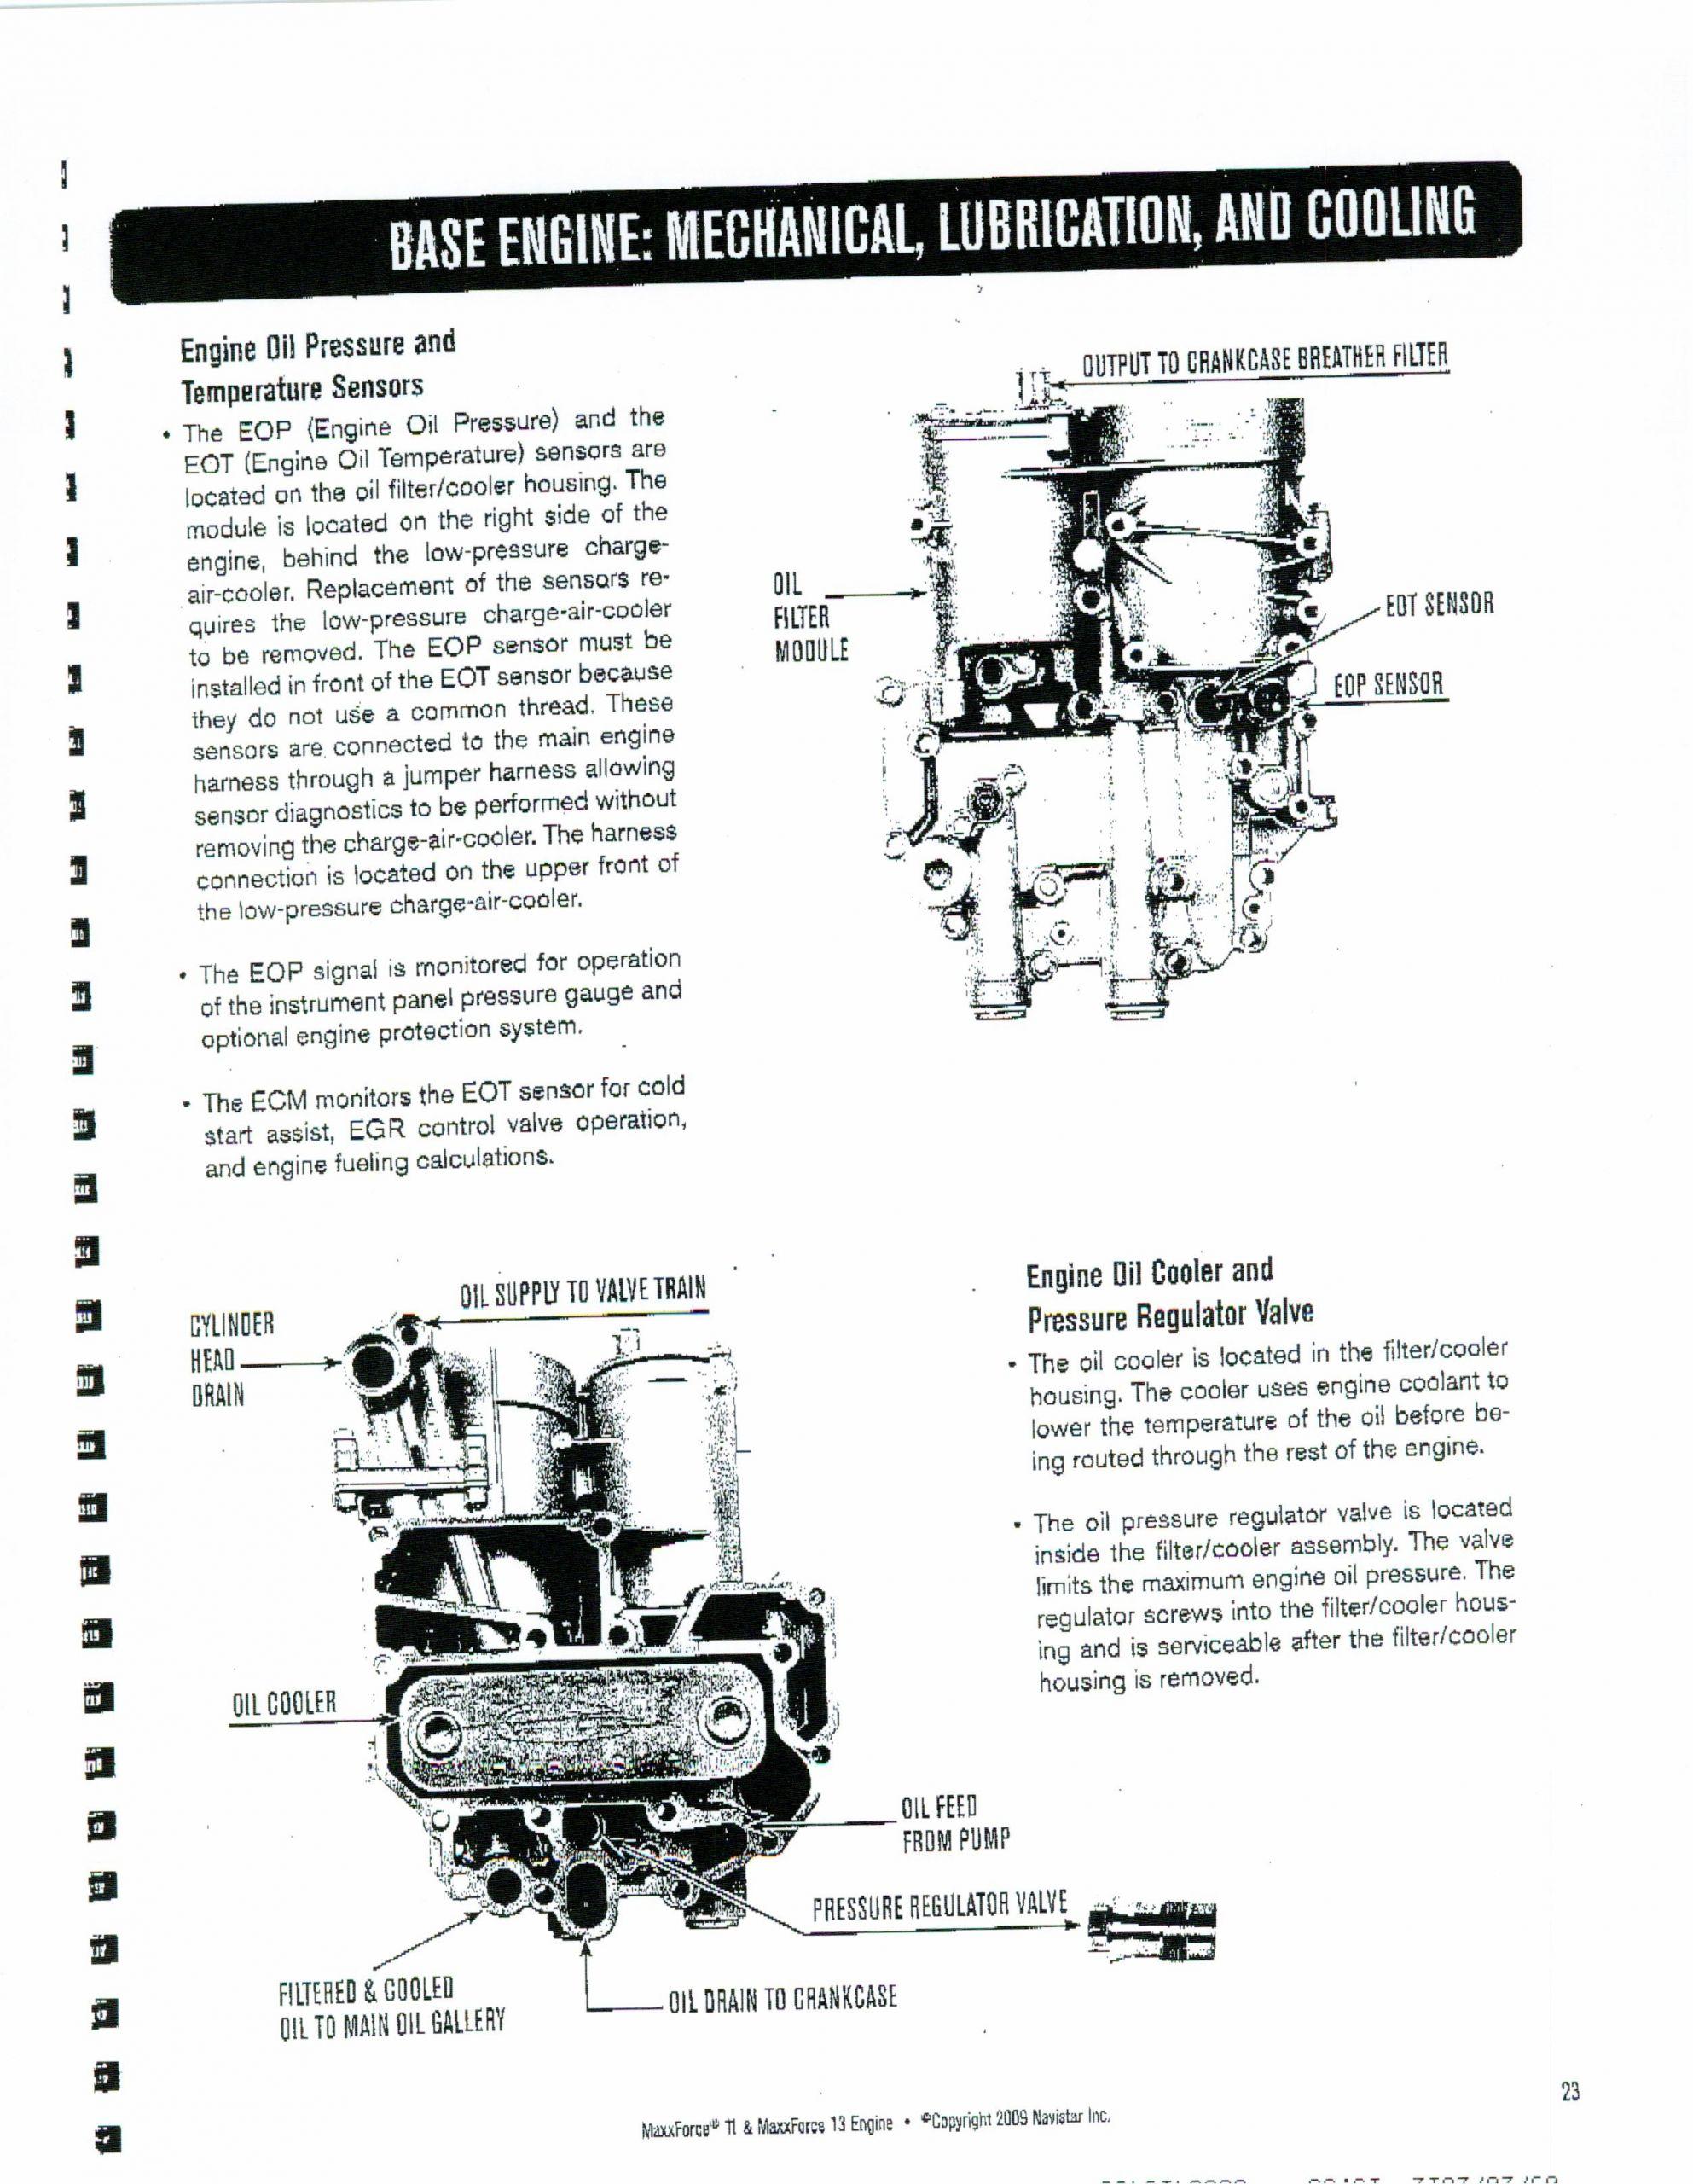 Maxxforce Dt Epa 13 Parts Breakdown 2012 Maxxforce 13 Throttle Pedal Wiring Diagram